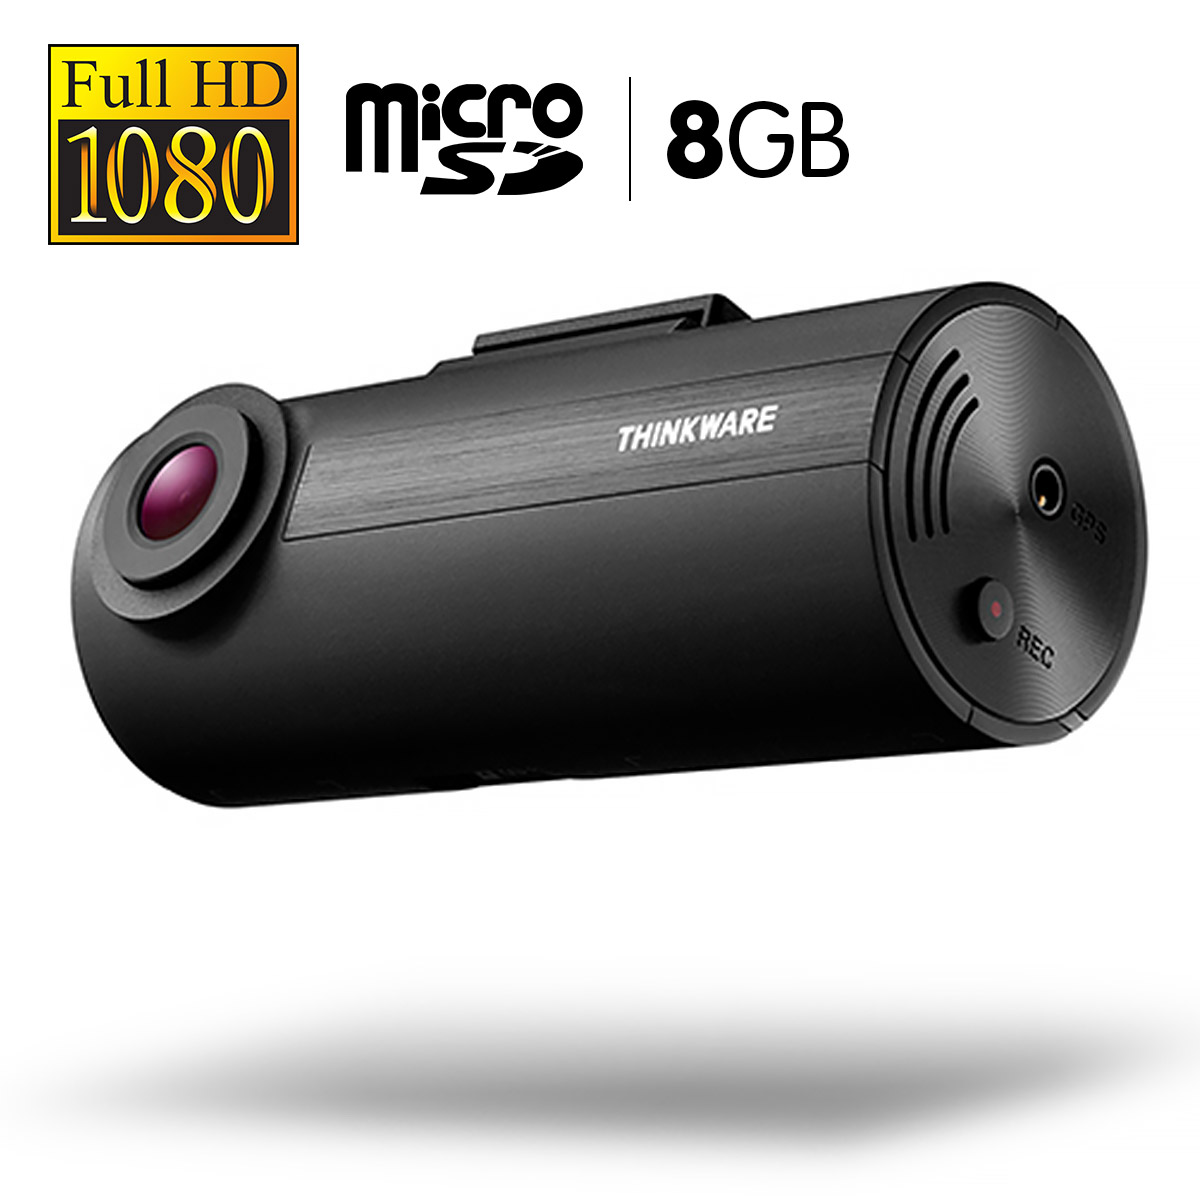 THINKWARE 1080P Full HD Dash Cam With 8GB Micro SD - F5008